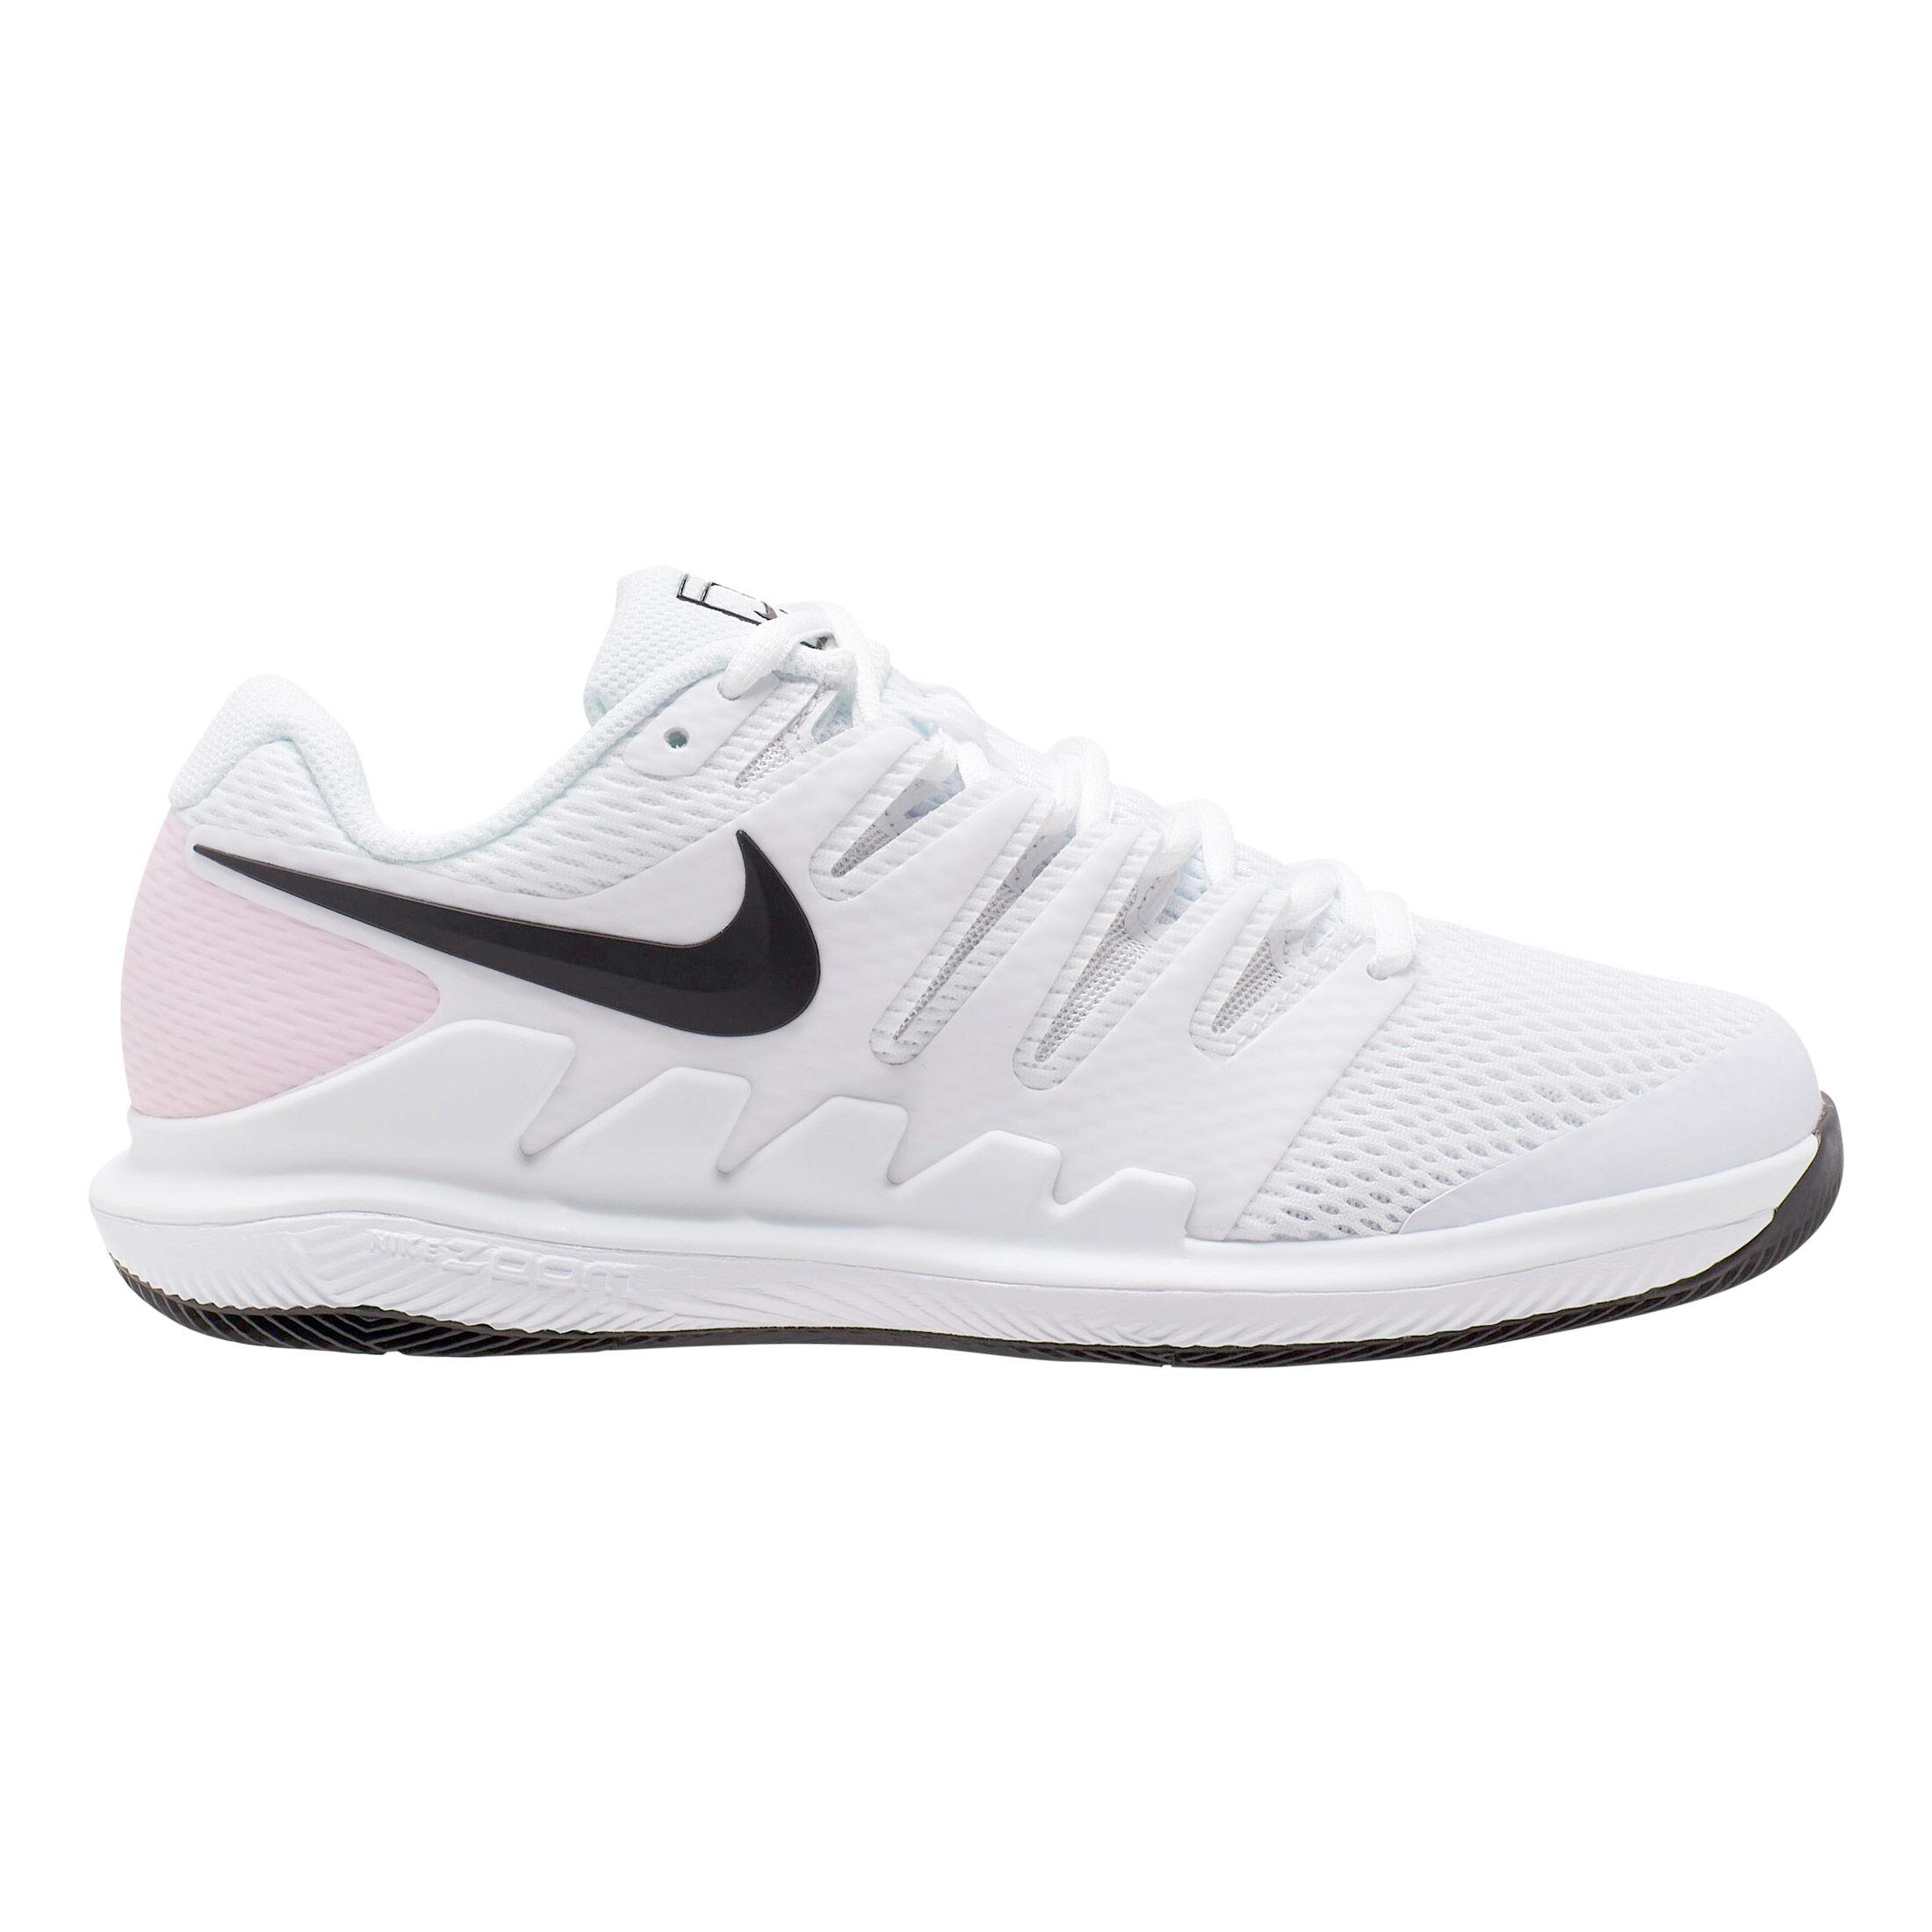 Nike Air Zoom Vapor X Chaussures Toutes Surfaces Femmes Blanc , Rosé